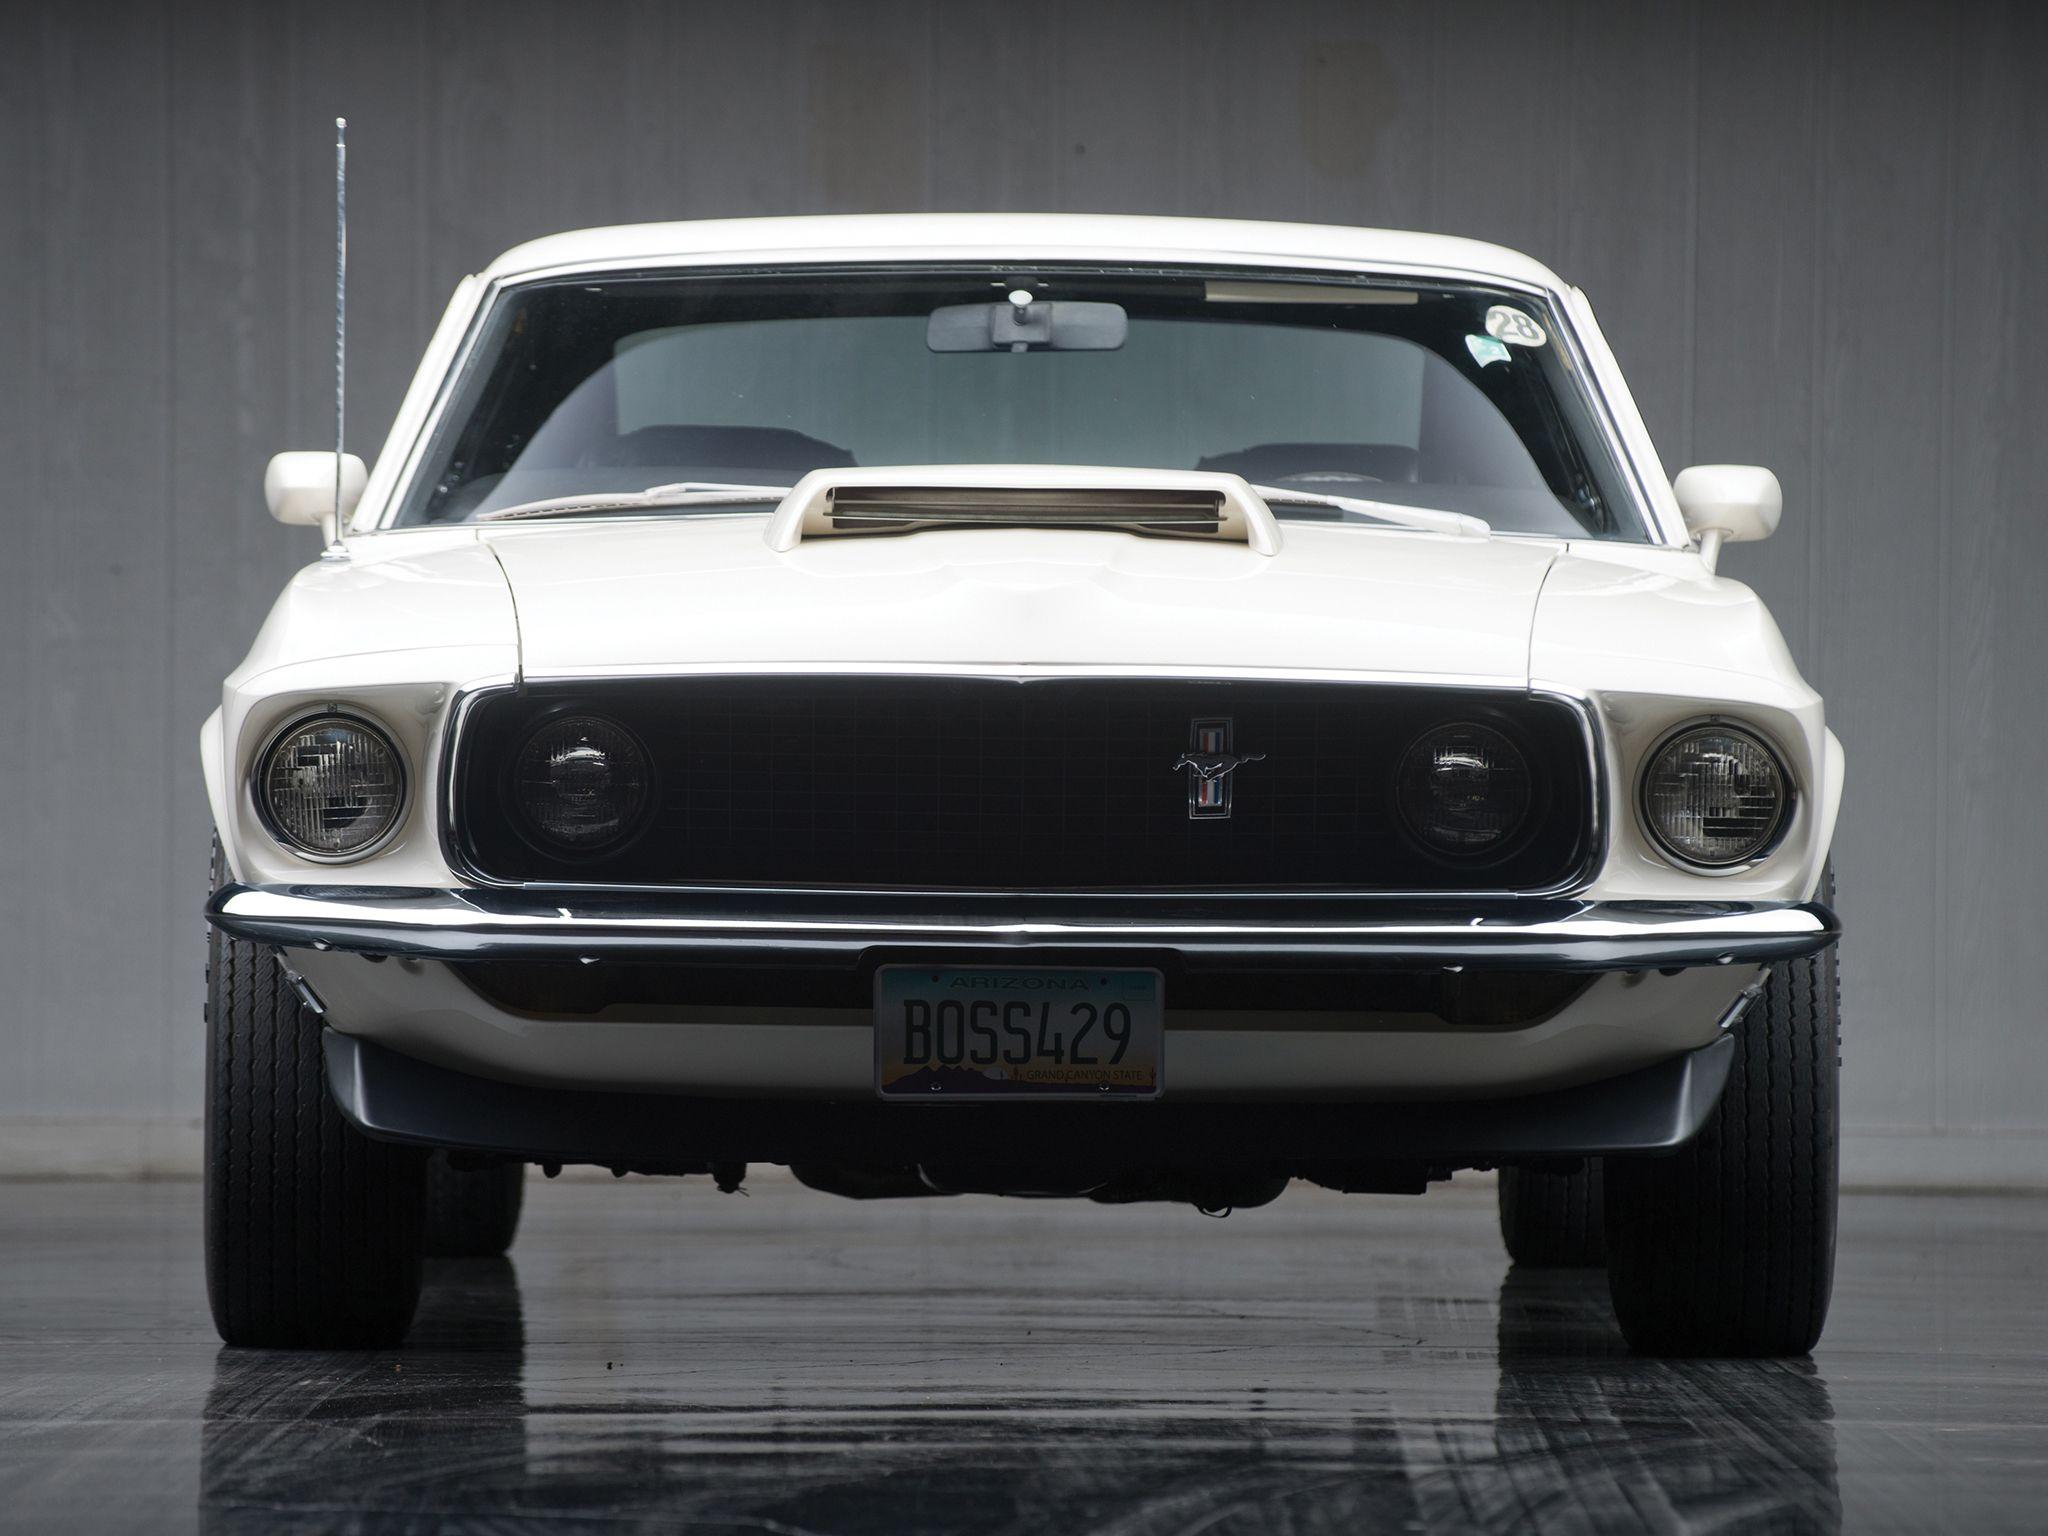 1969 Mustang Boss 429 Its Sooo Beautiful Ford Mustang Boss Mustang Boss Mustang